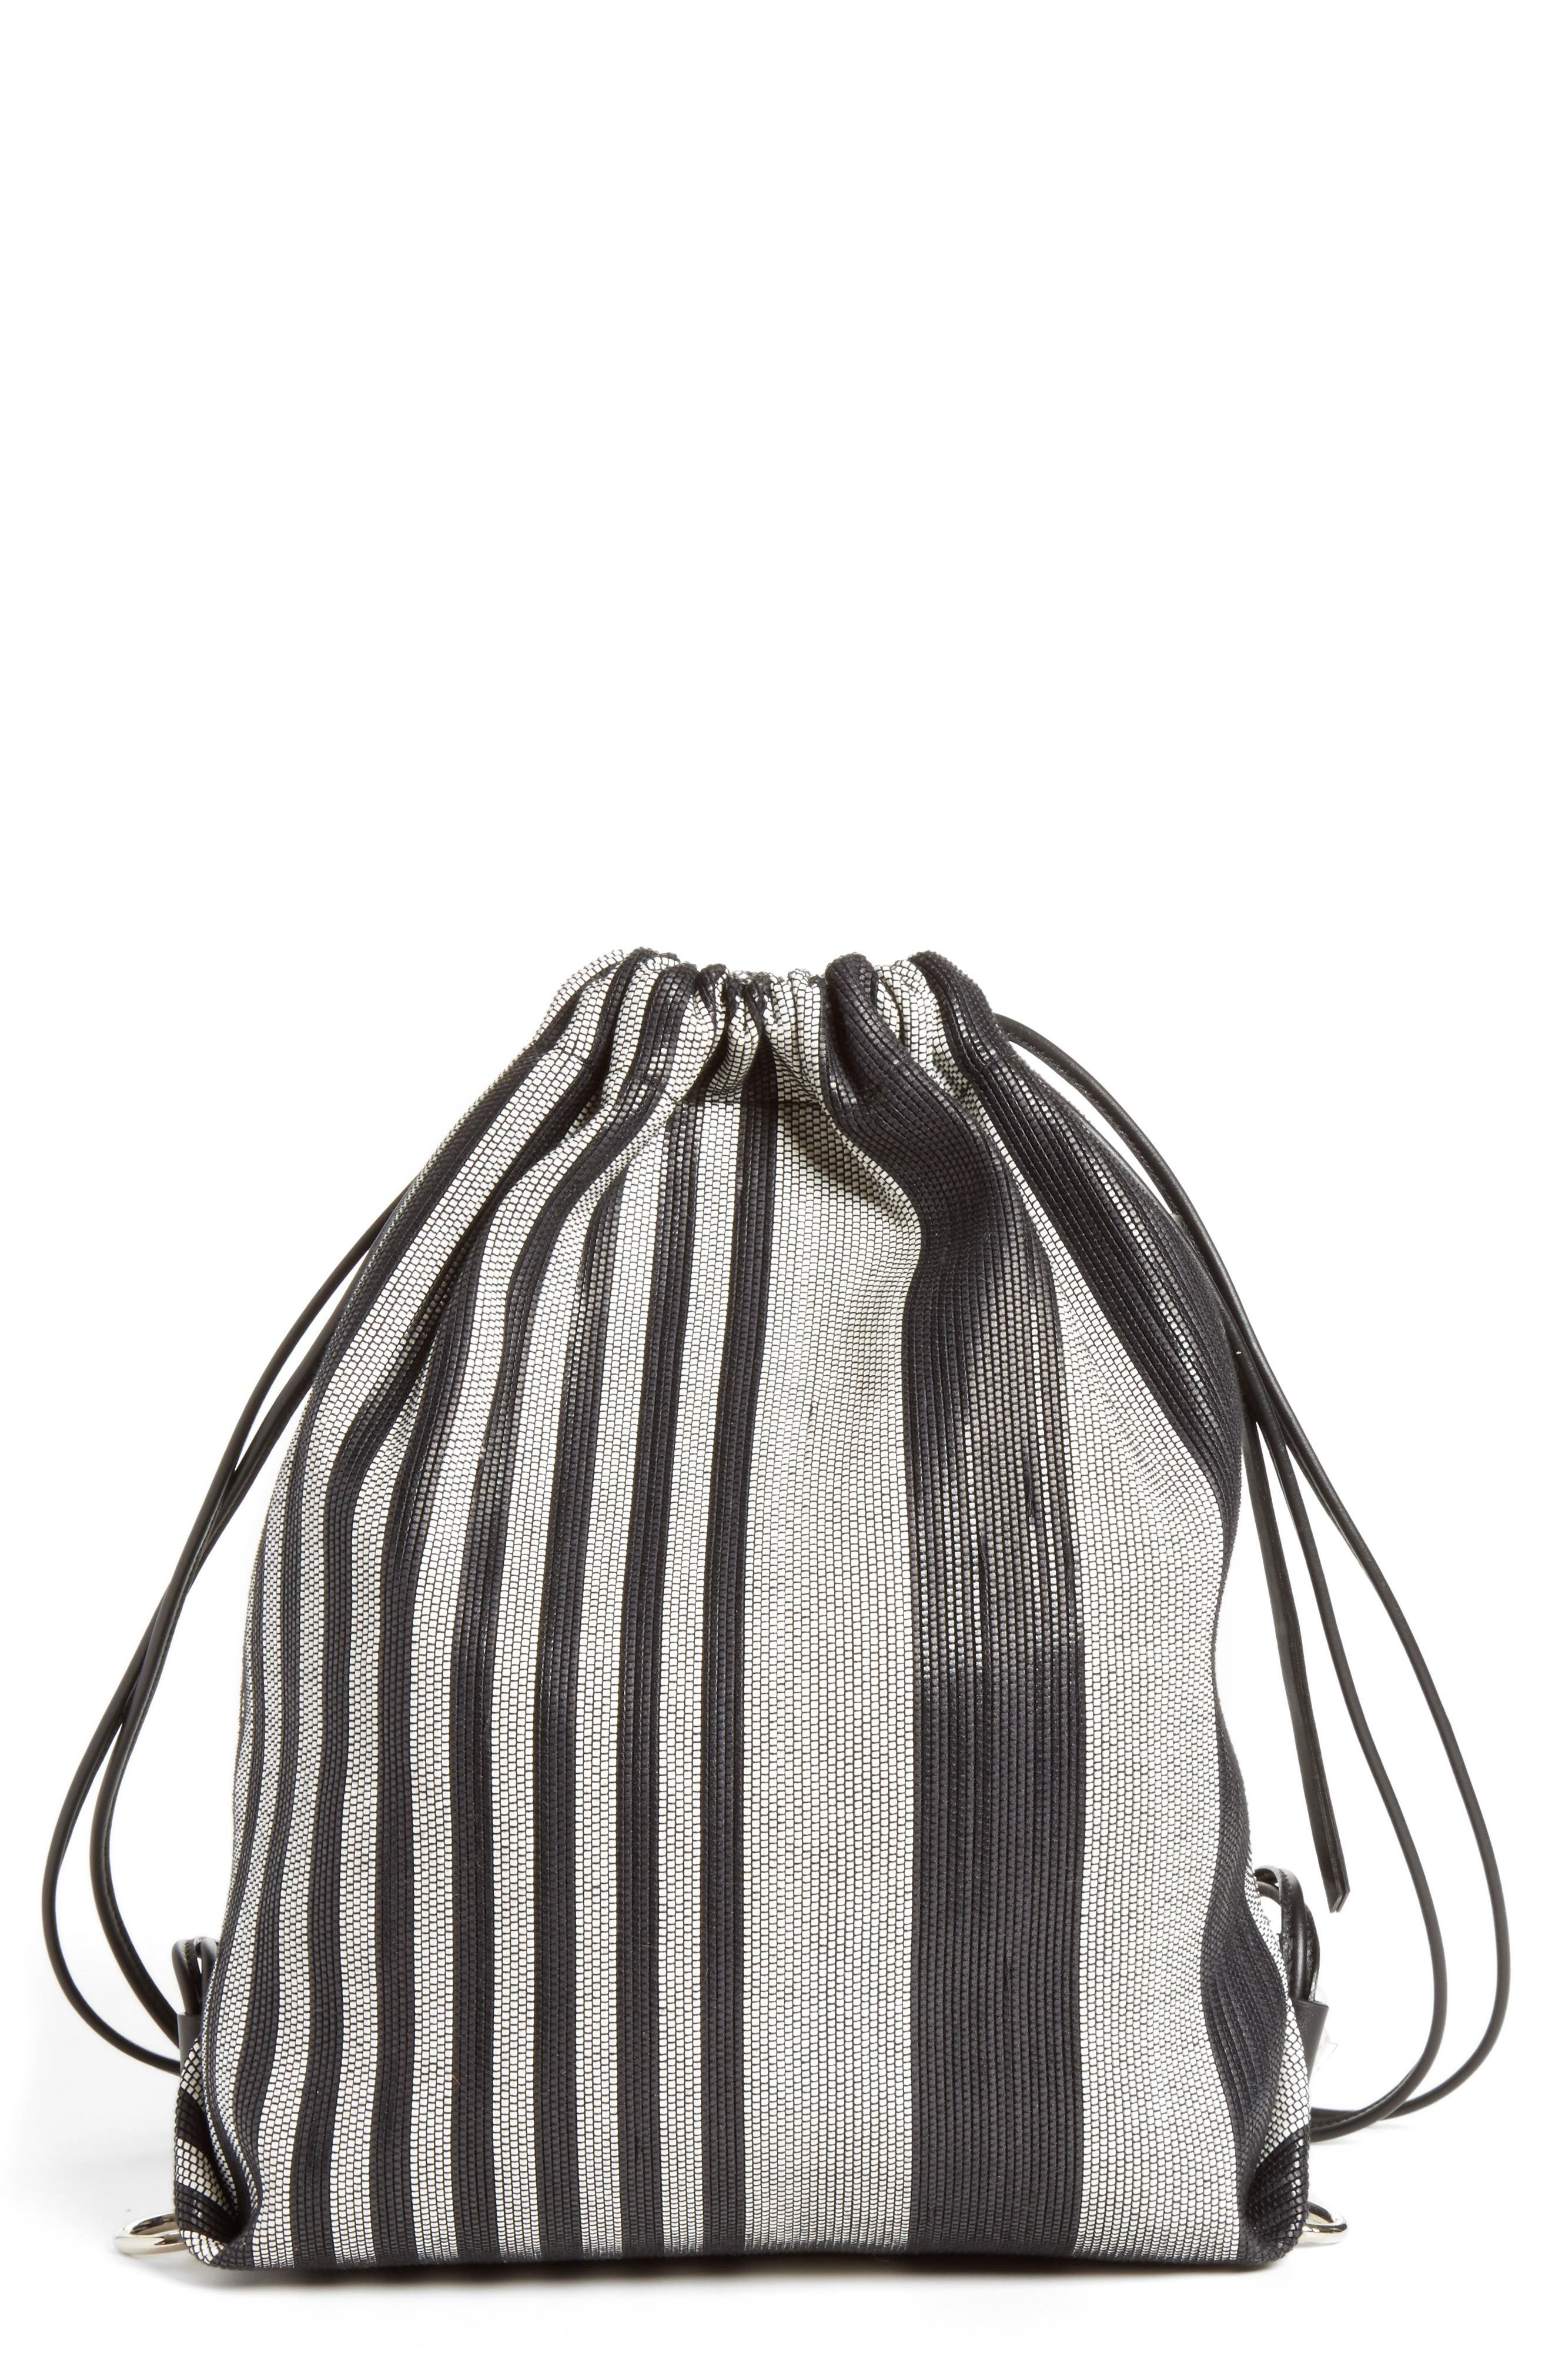 Drawstring Backpack,                             Main thumbnail 1, color,                             Black/White